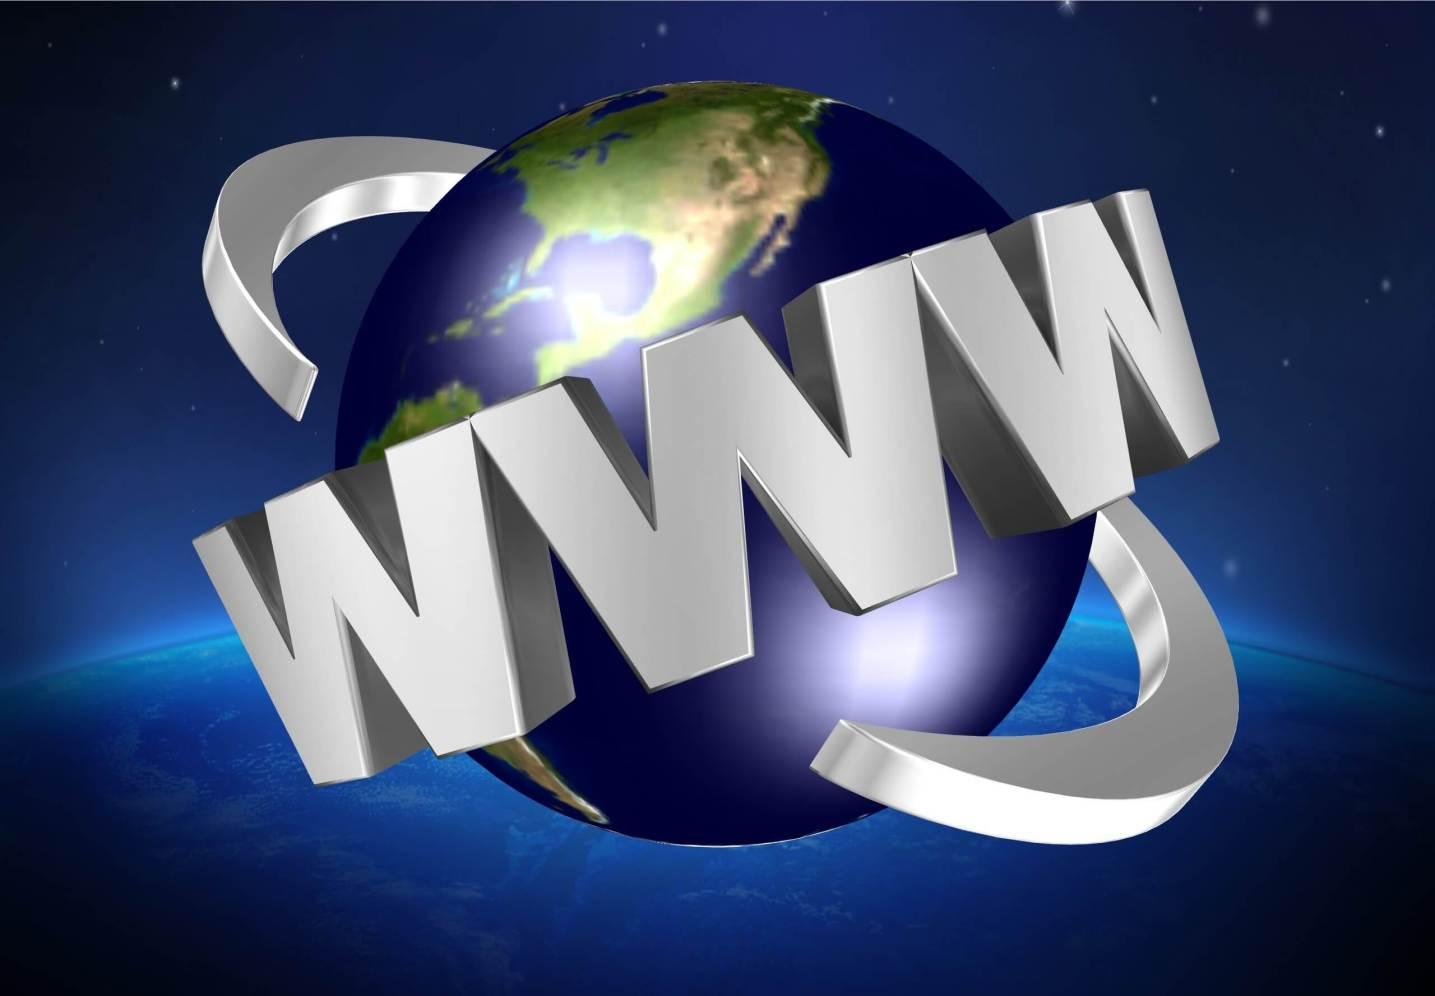 do you need www in web address